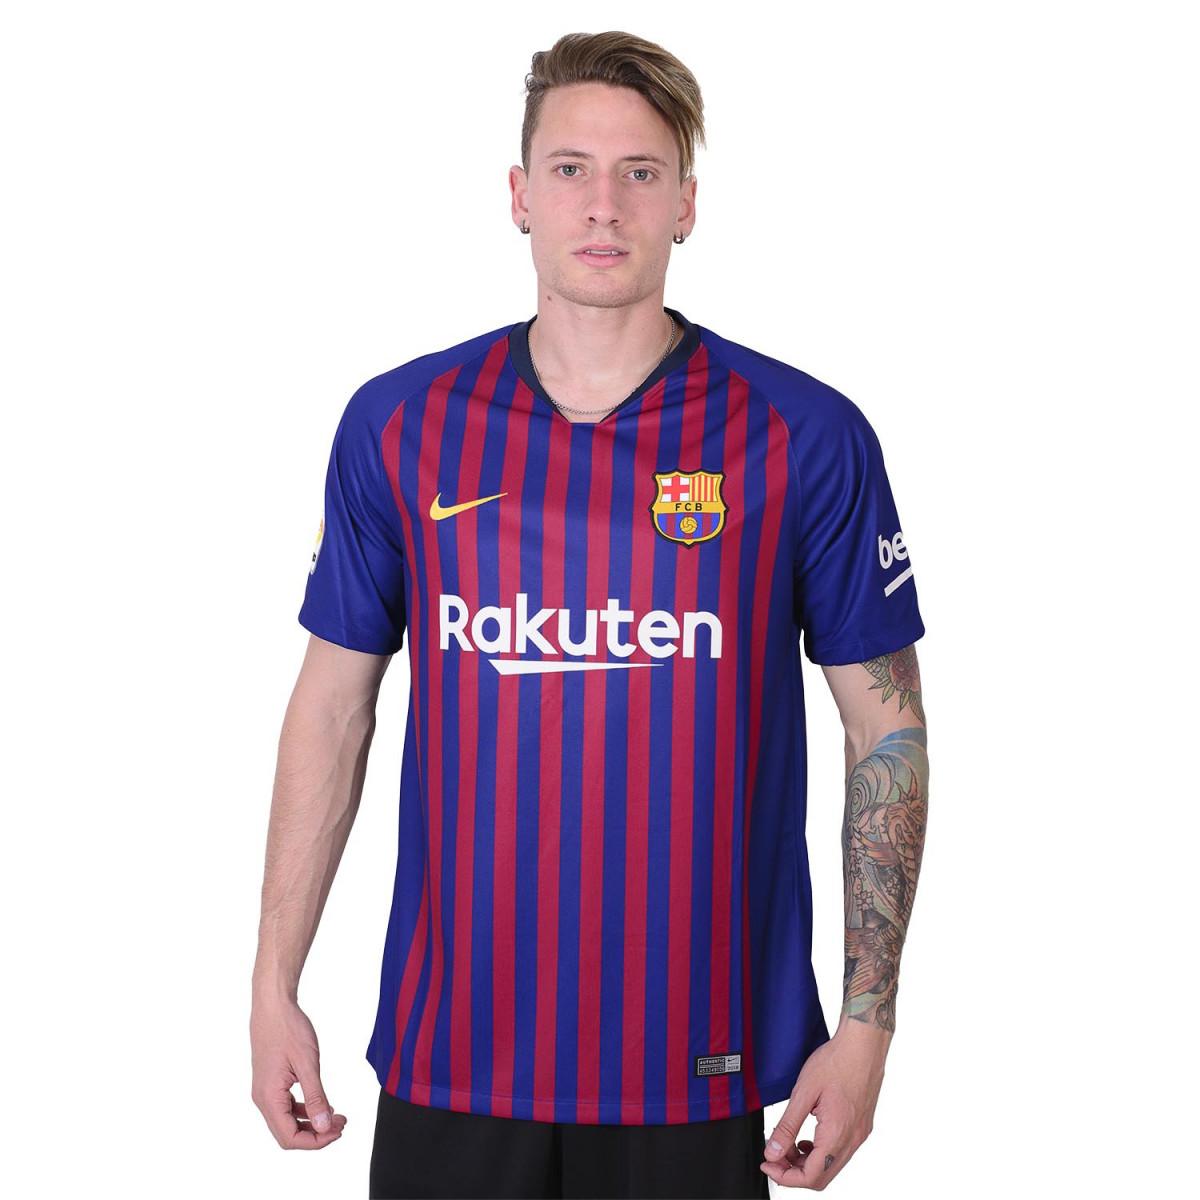 4dc3ecf7d0ed8 Camiseta Nike Fc Barcelona Stadium Home 2018 2019 - Indumentaria ...